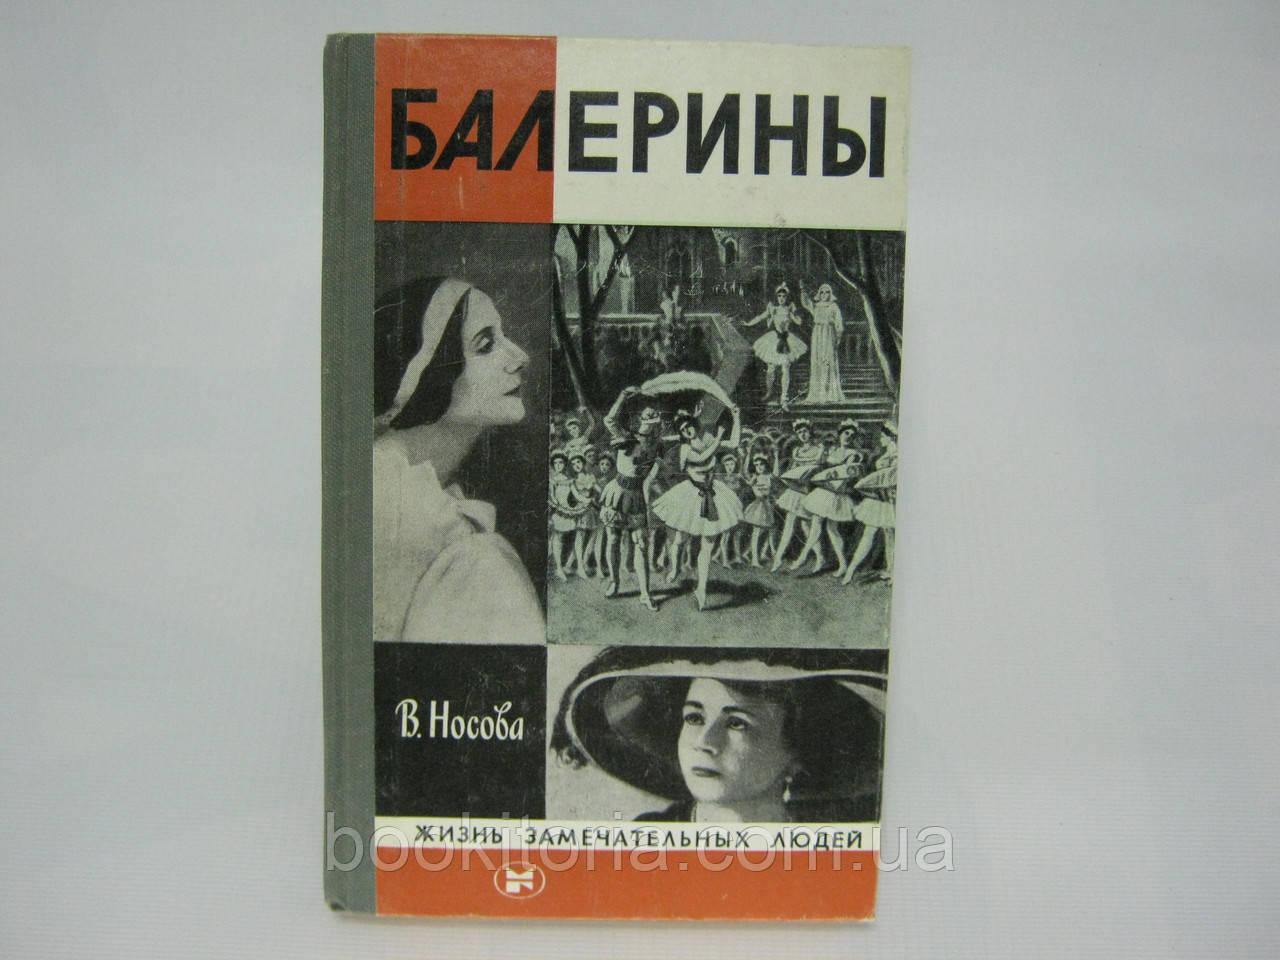 Носова В.В. Балерины (б/у).